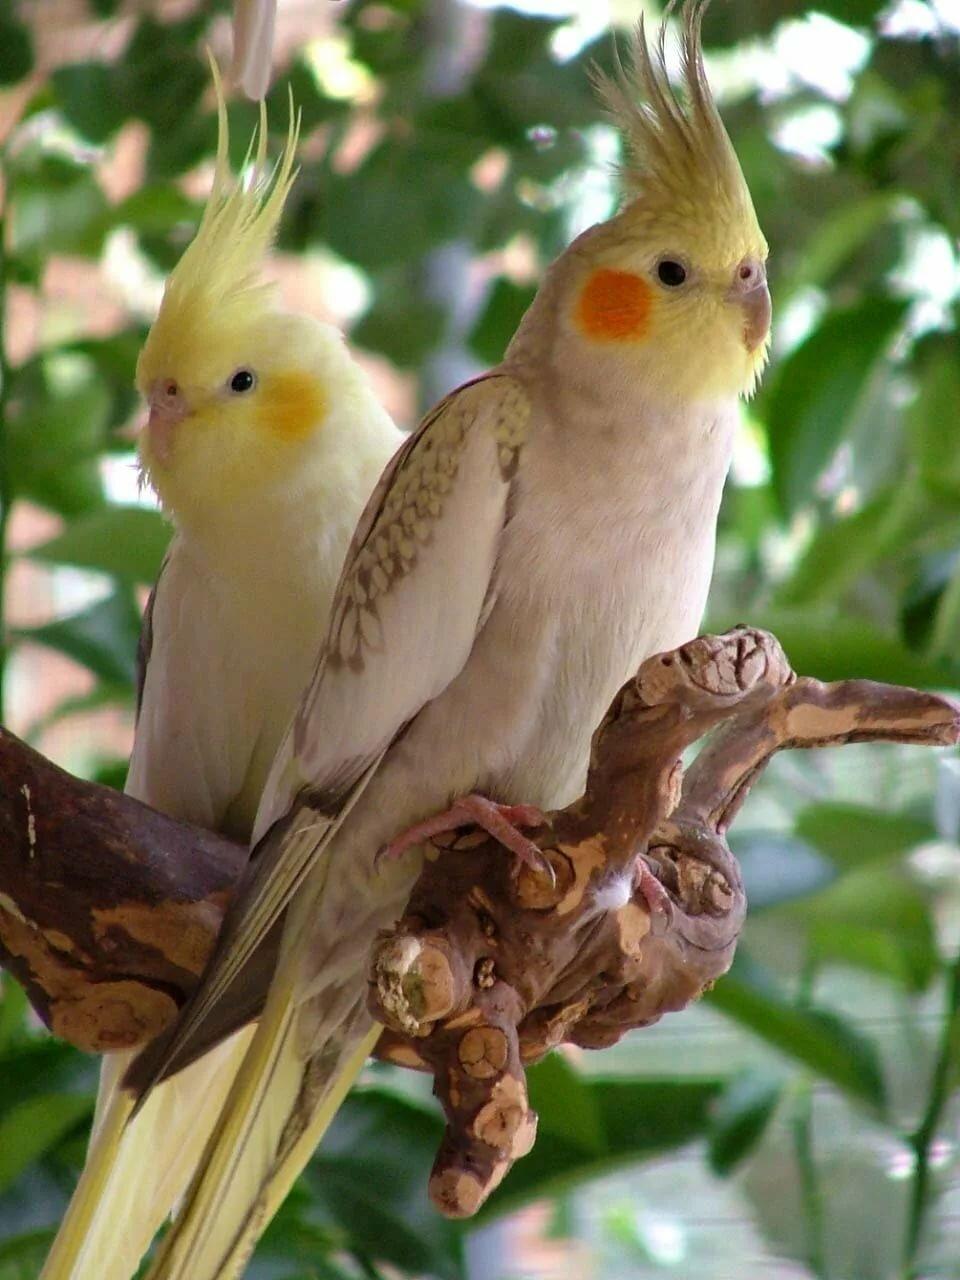 Я свободна как птица в небесах картинки что